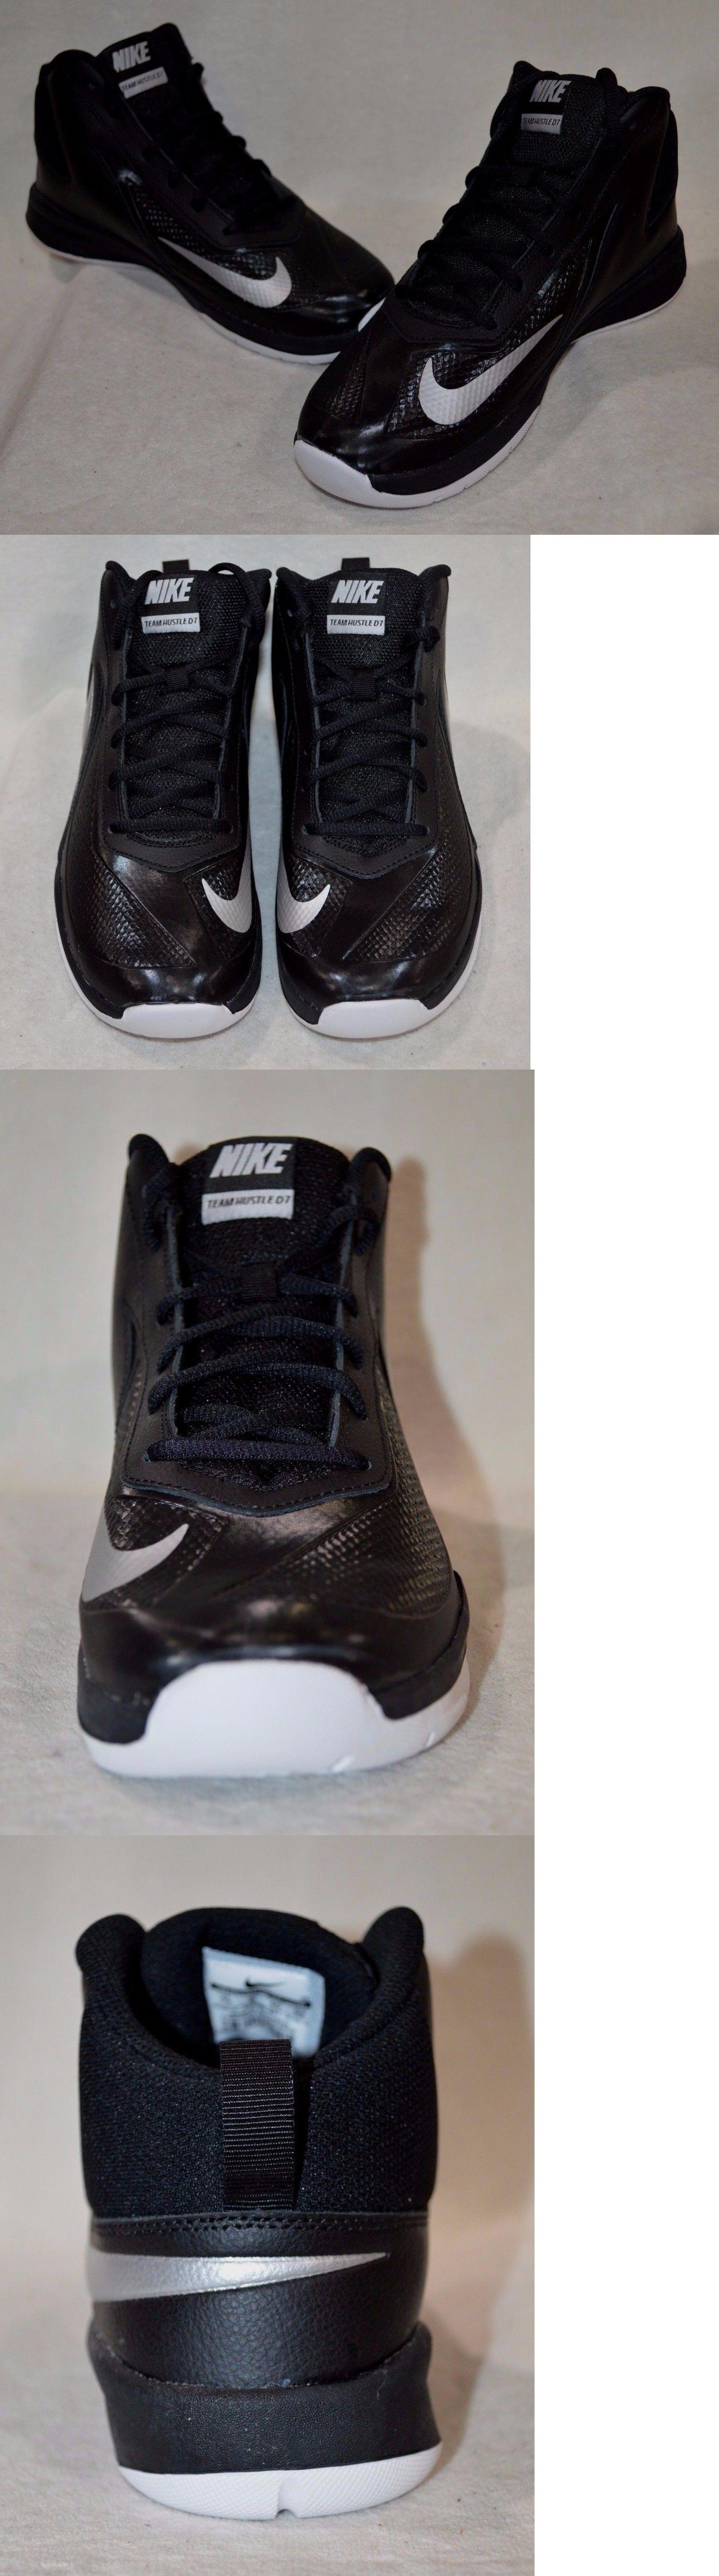 3c0aef2902bace Boys Shoes 57929  Nike Team Hustle D 7 (Gs) Boys Basketball Shoes ...